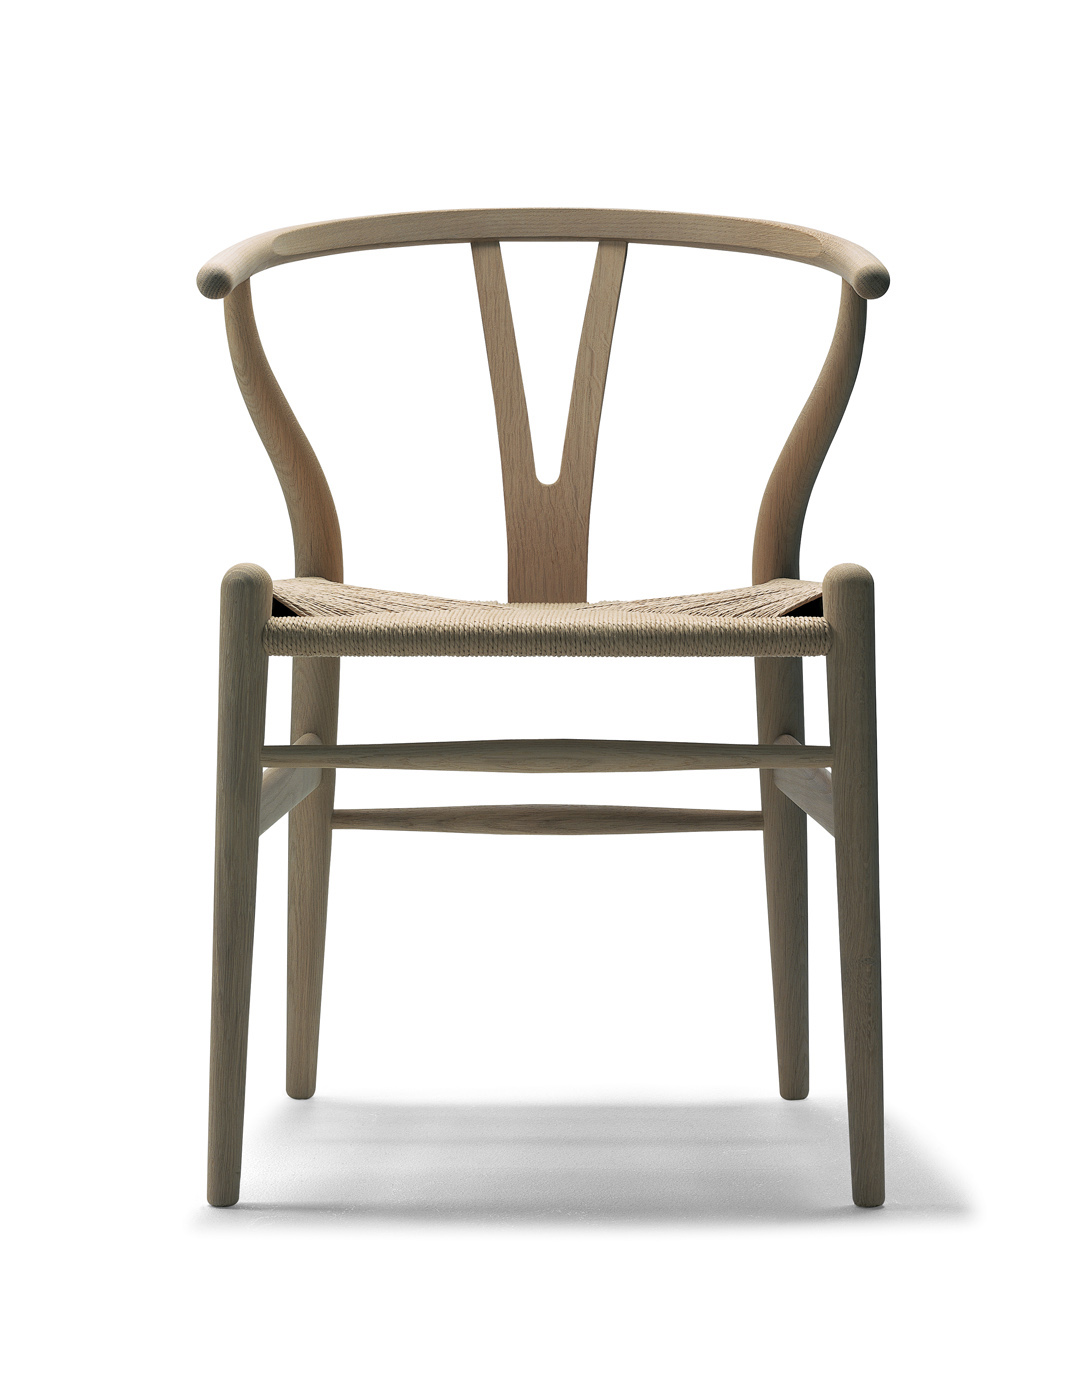 Carl Hansen – CH24 Wishbone Chair